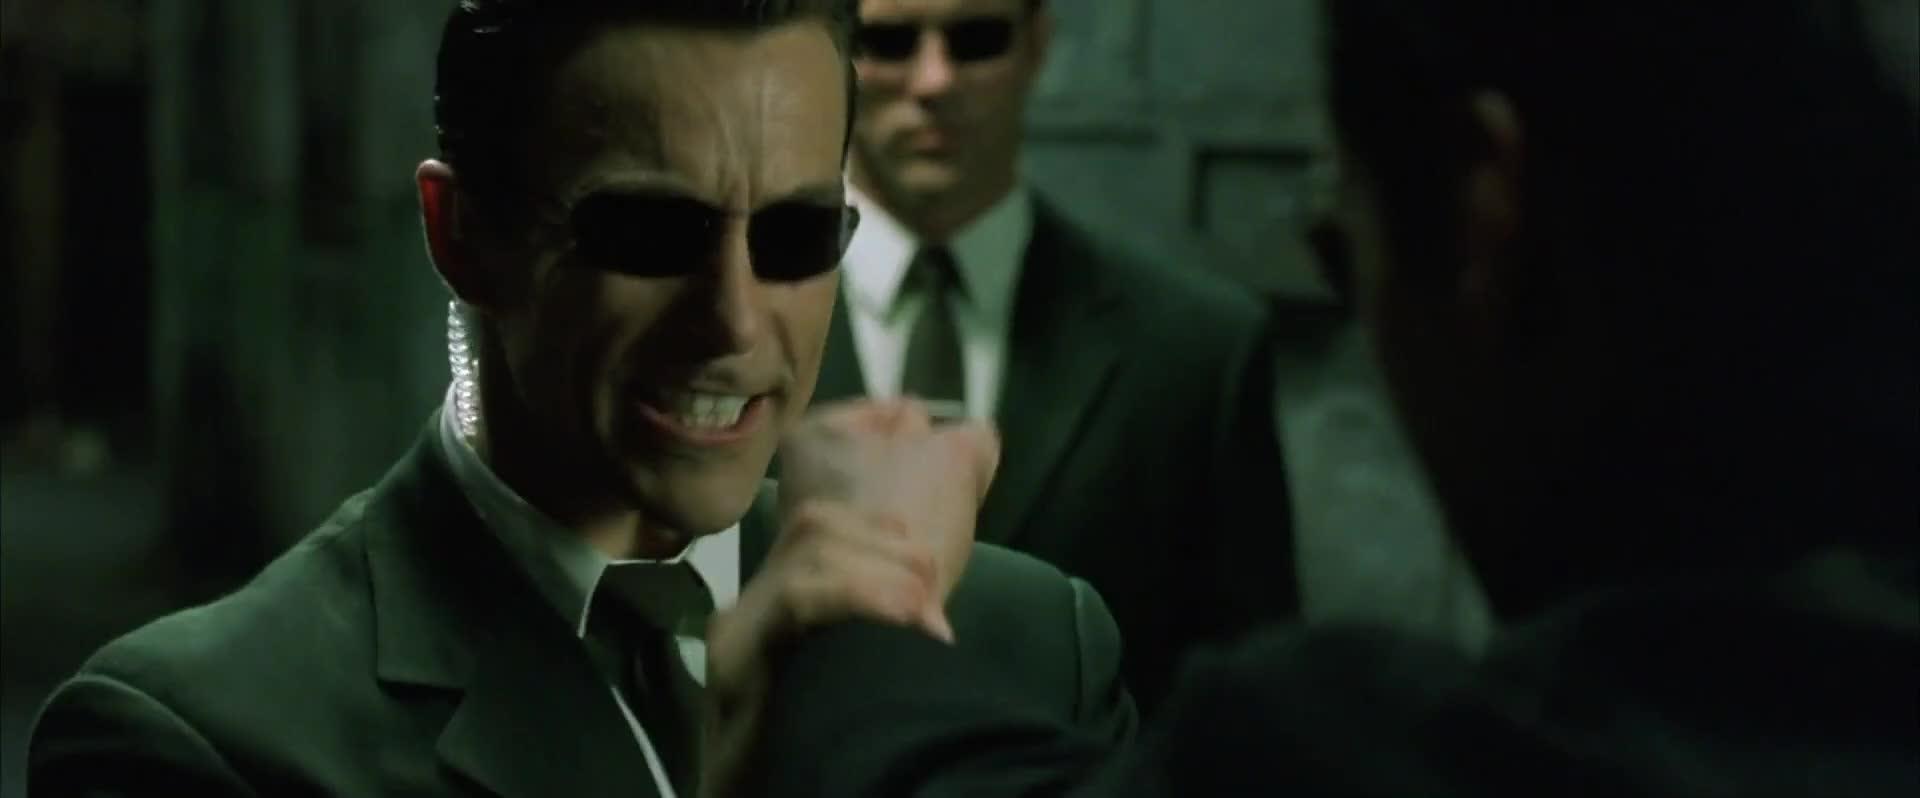 The Matrix Reloaded เดอะ เมทริกซ์ รีโหลดเดด สงครามมนุษย์เหนือโลก (2003)